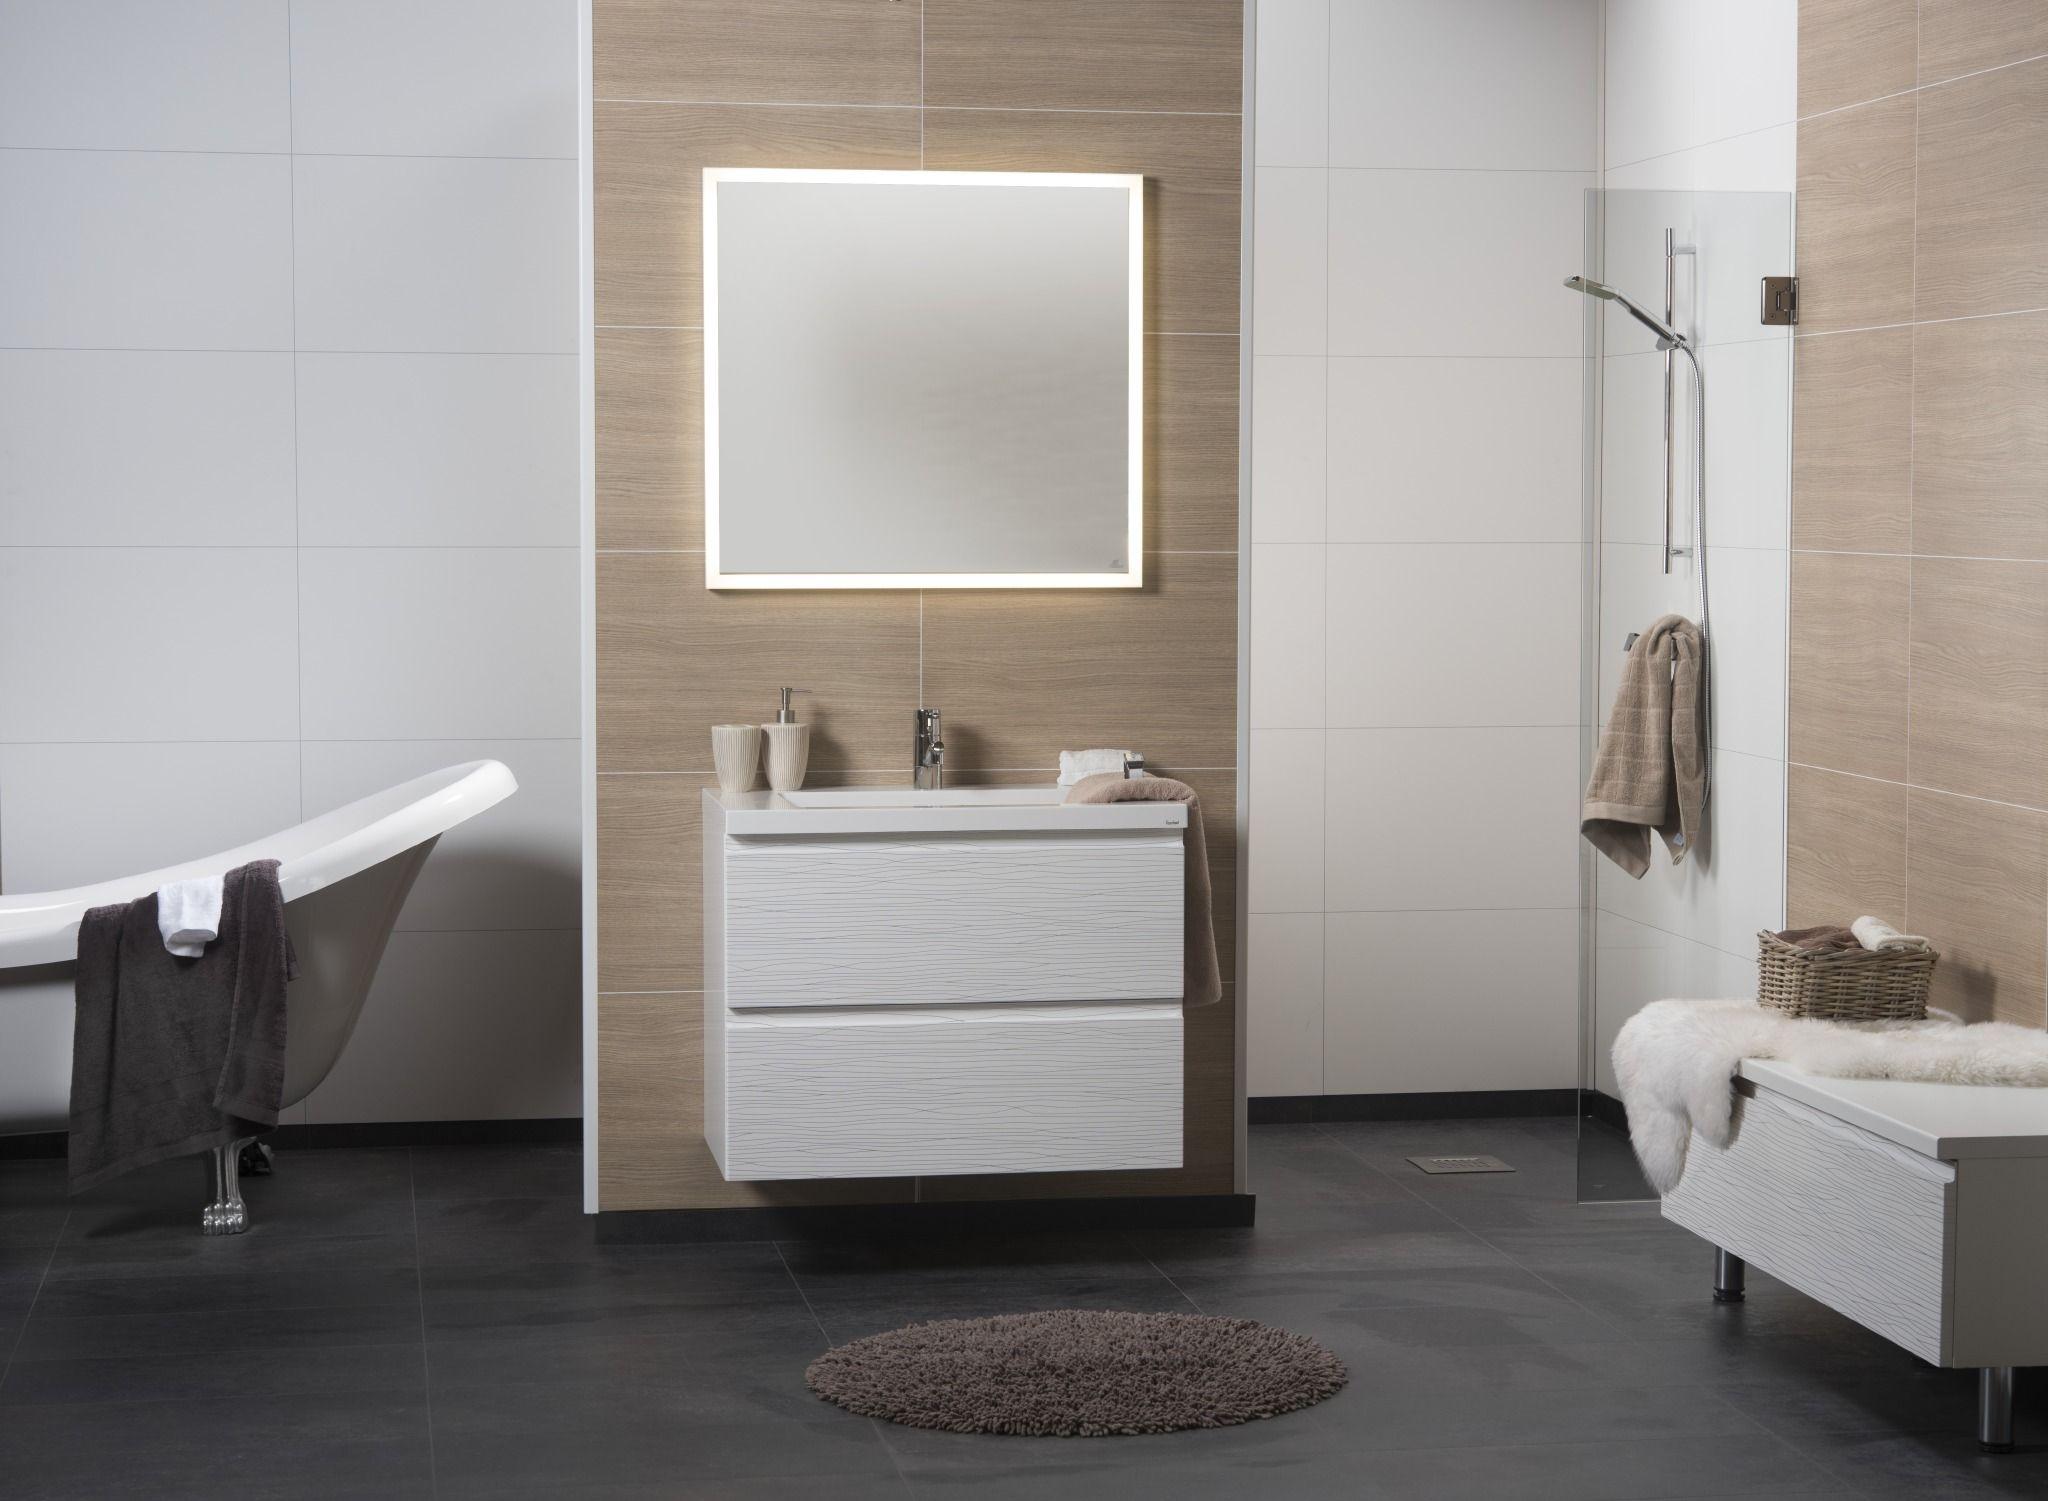 Badezimmerplaner Online ~ 20 best bad images on pinterest bathroom bathroom ideas and showers